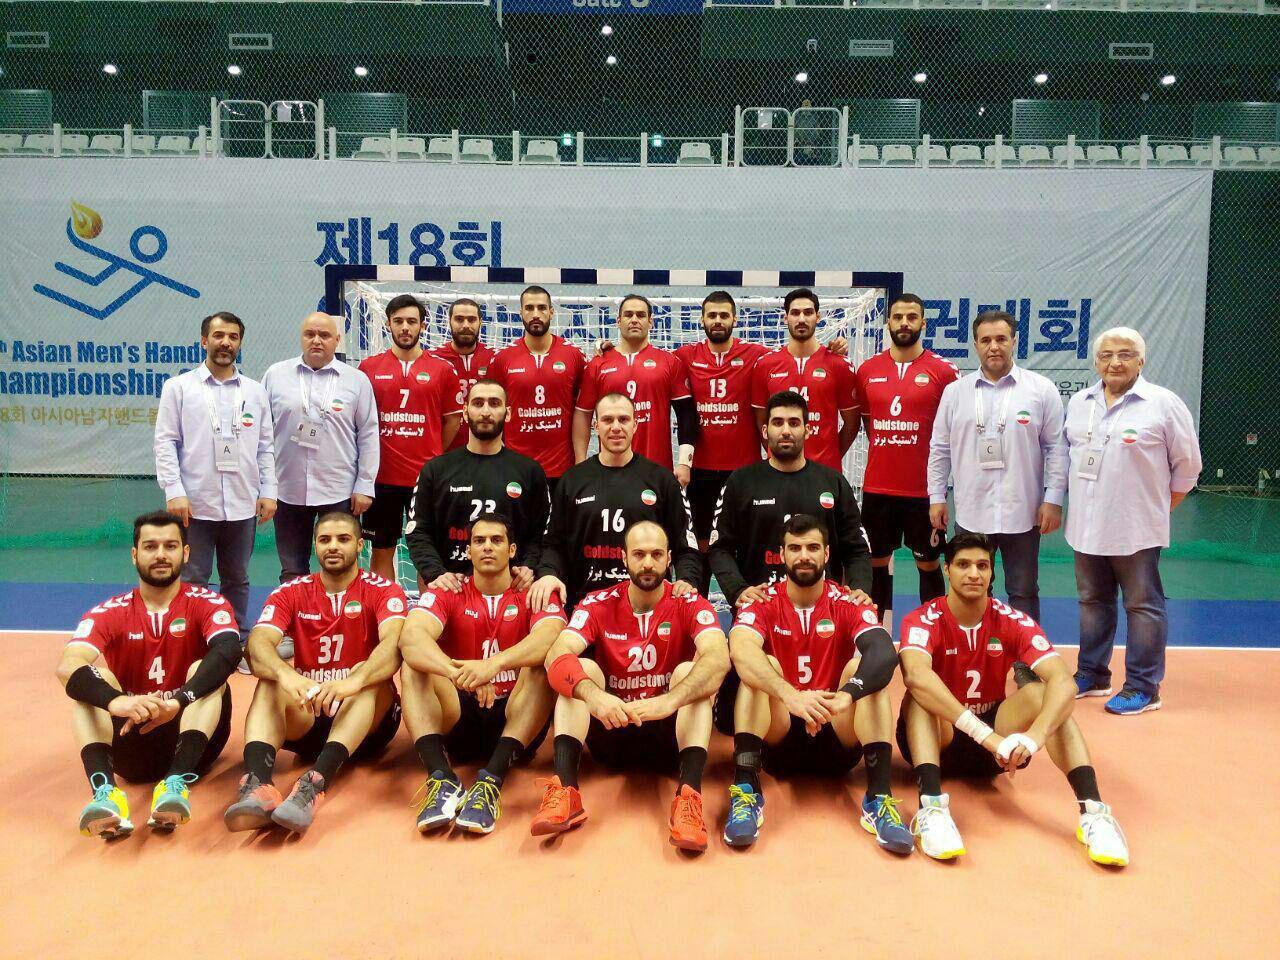 16 handball group level 2 - Asian Games 2018 Handball